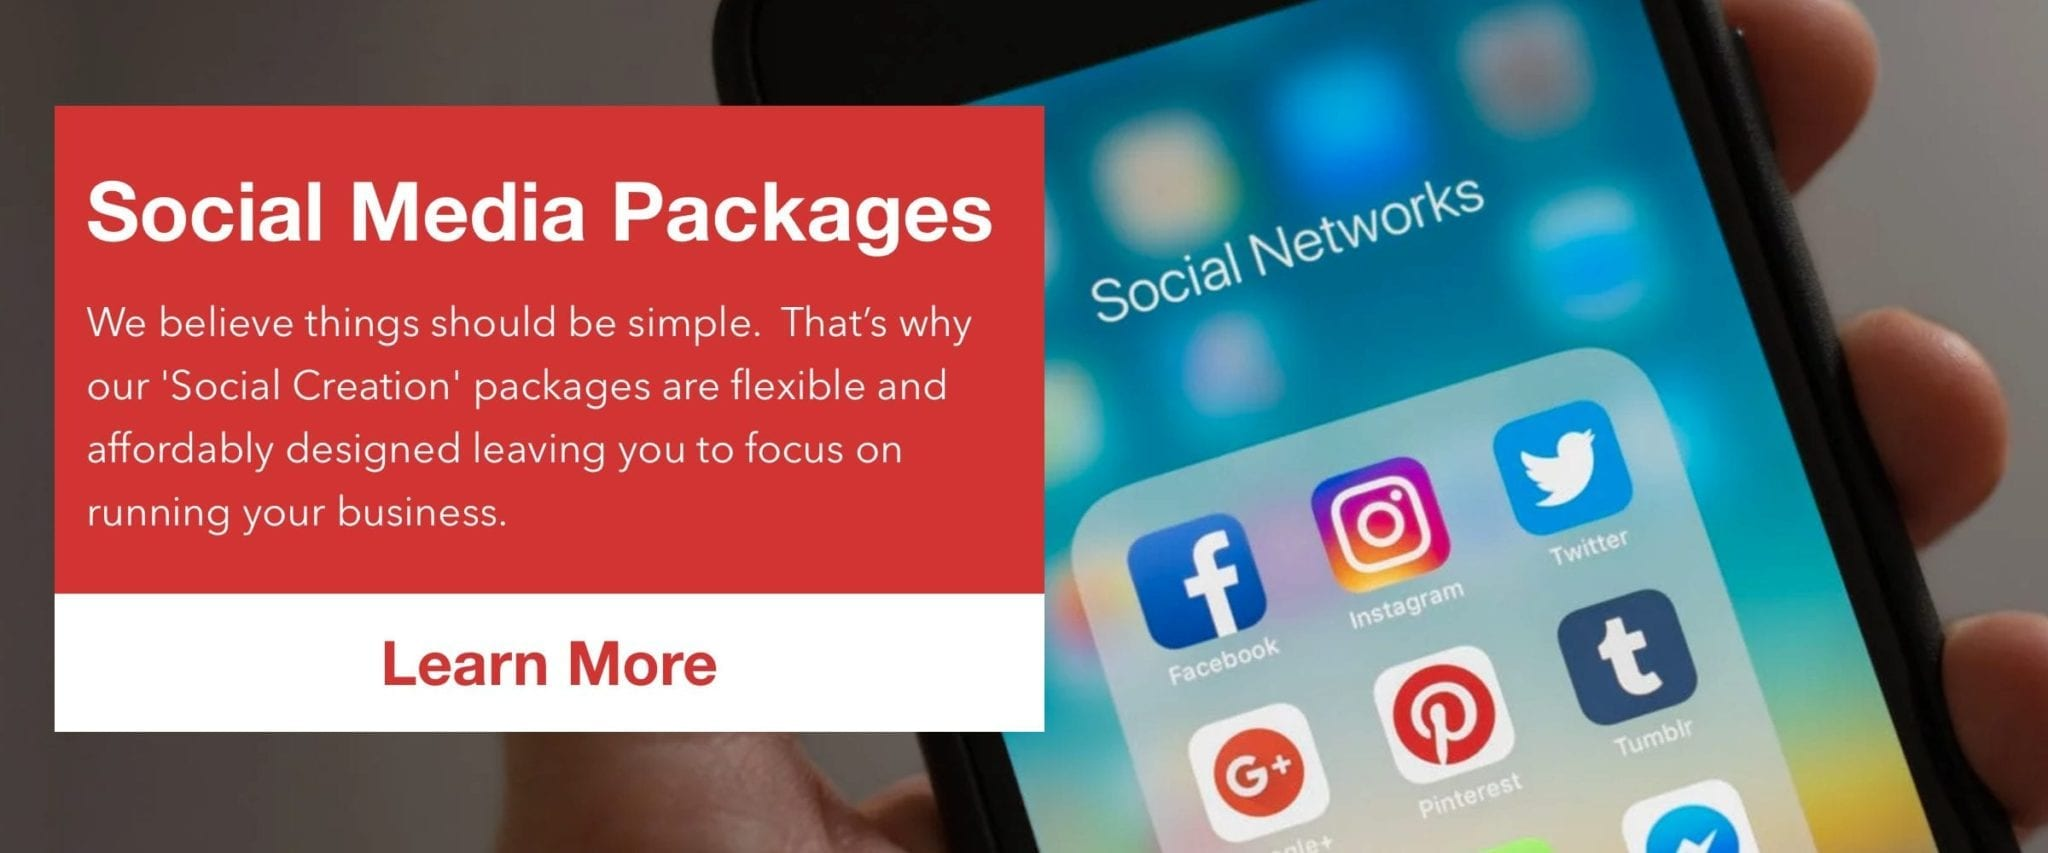 banner-social-media-packages